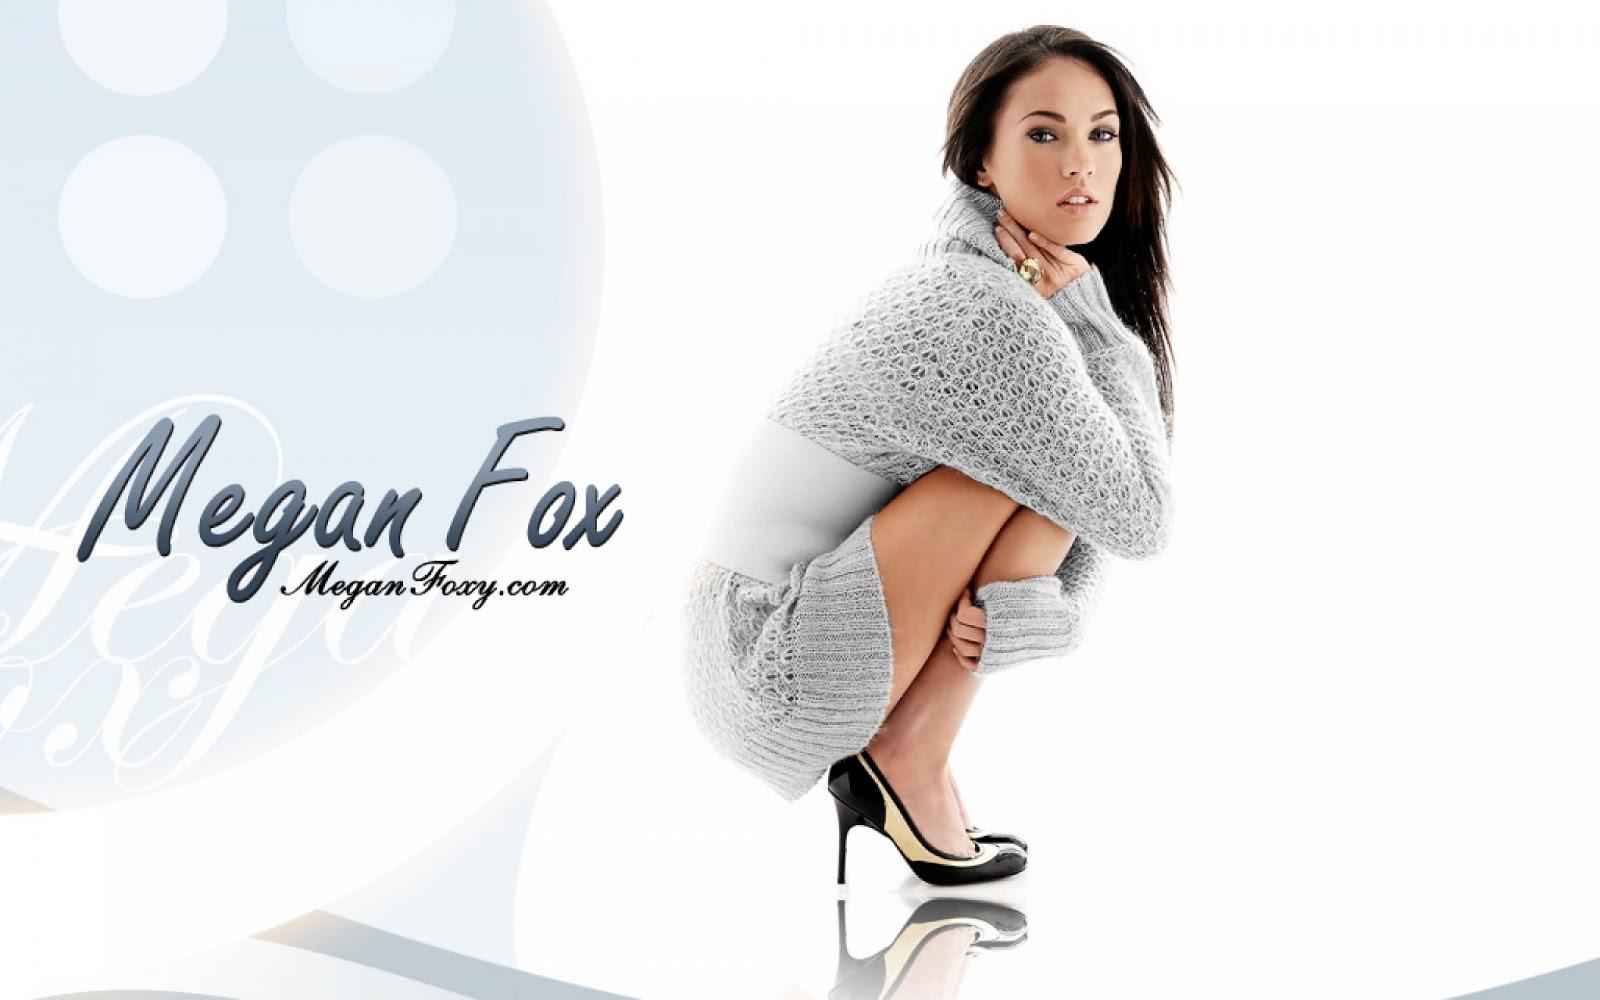 Hollywood Megan Fox HD Wallpapers 2013 1600x1000